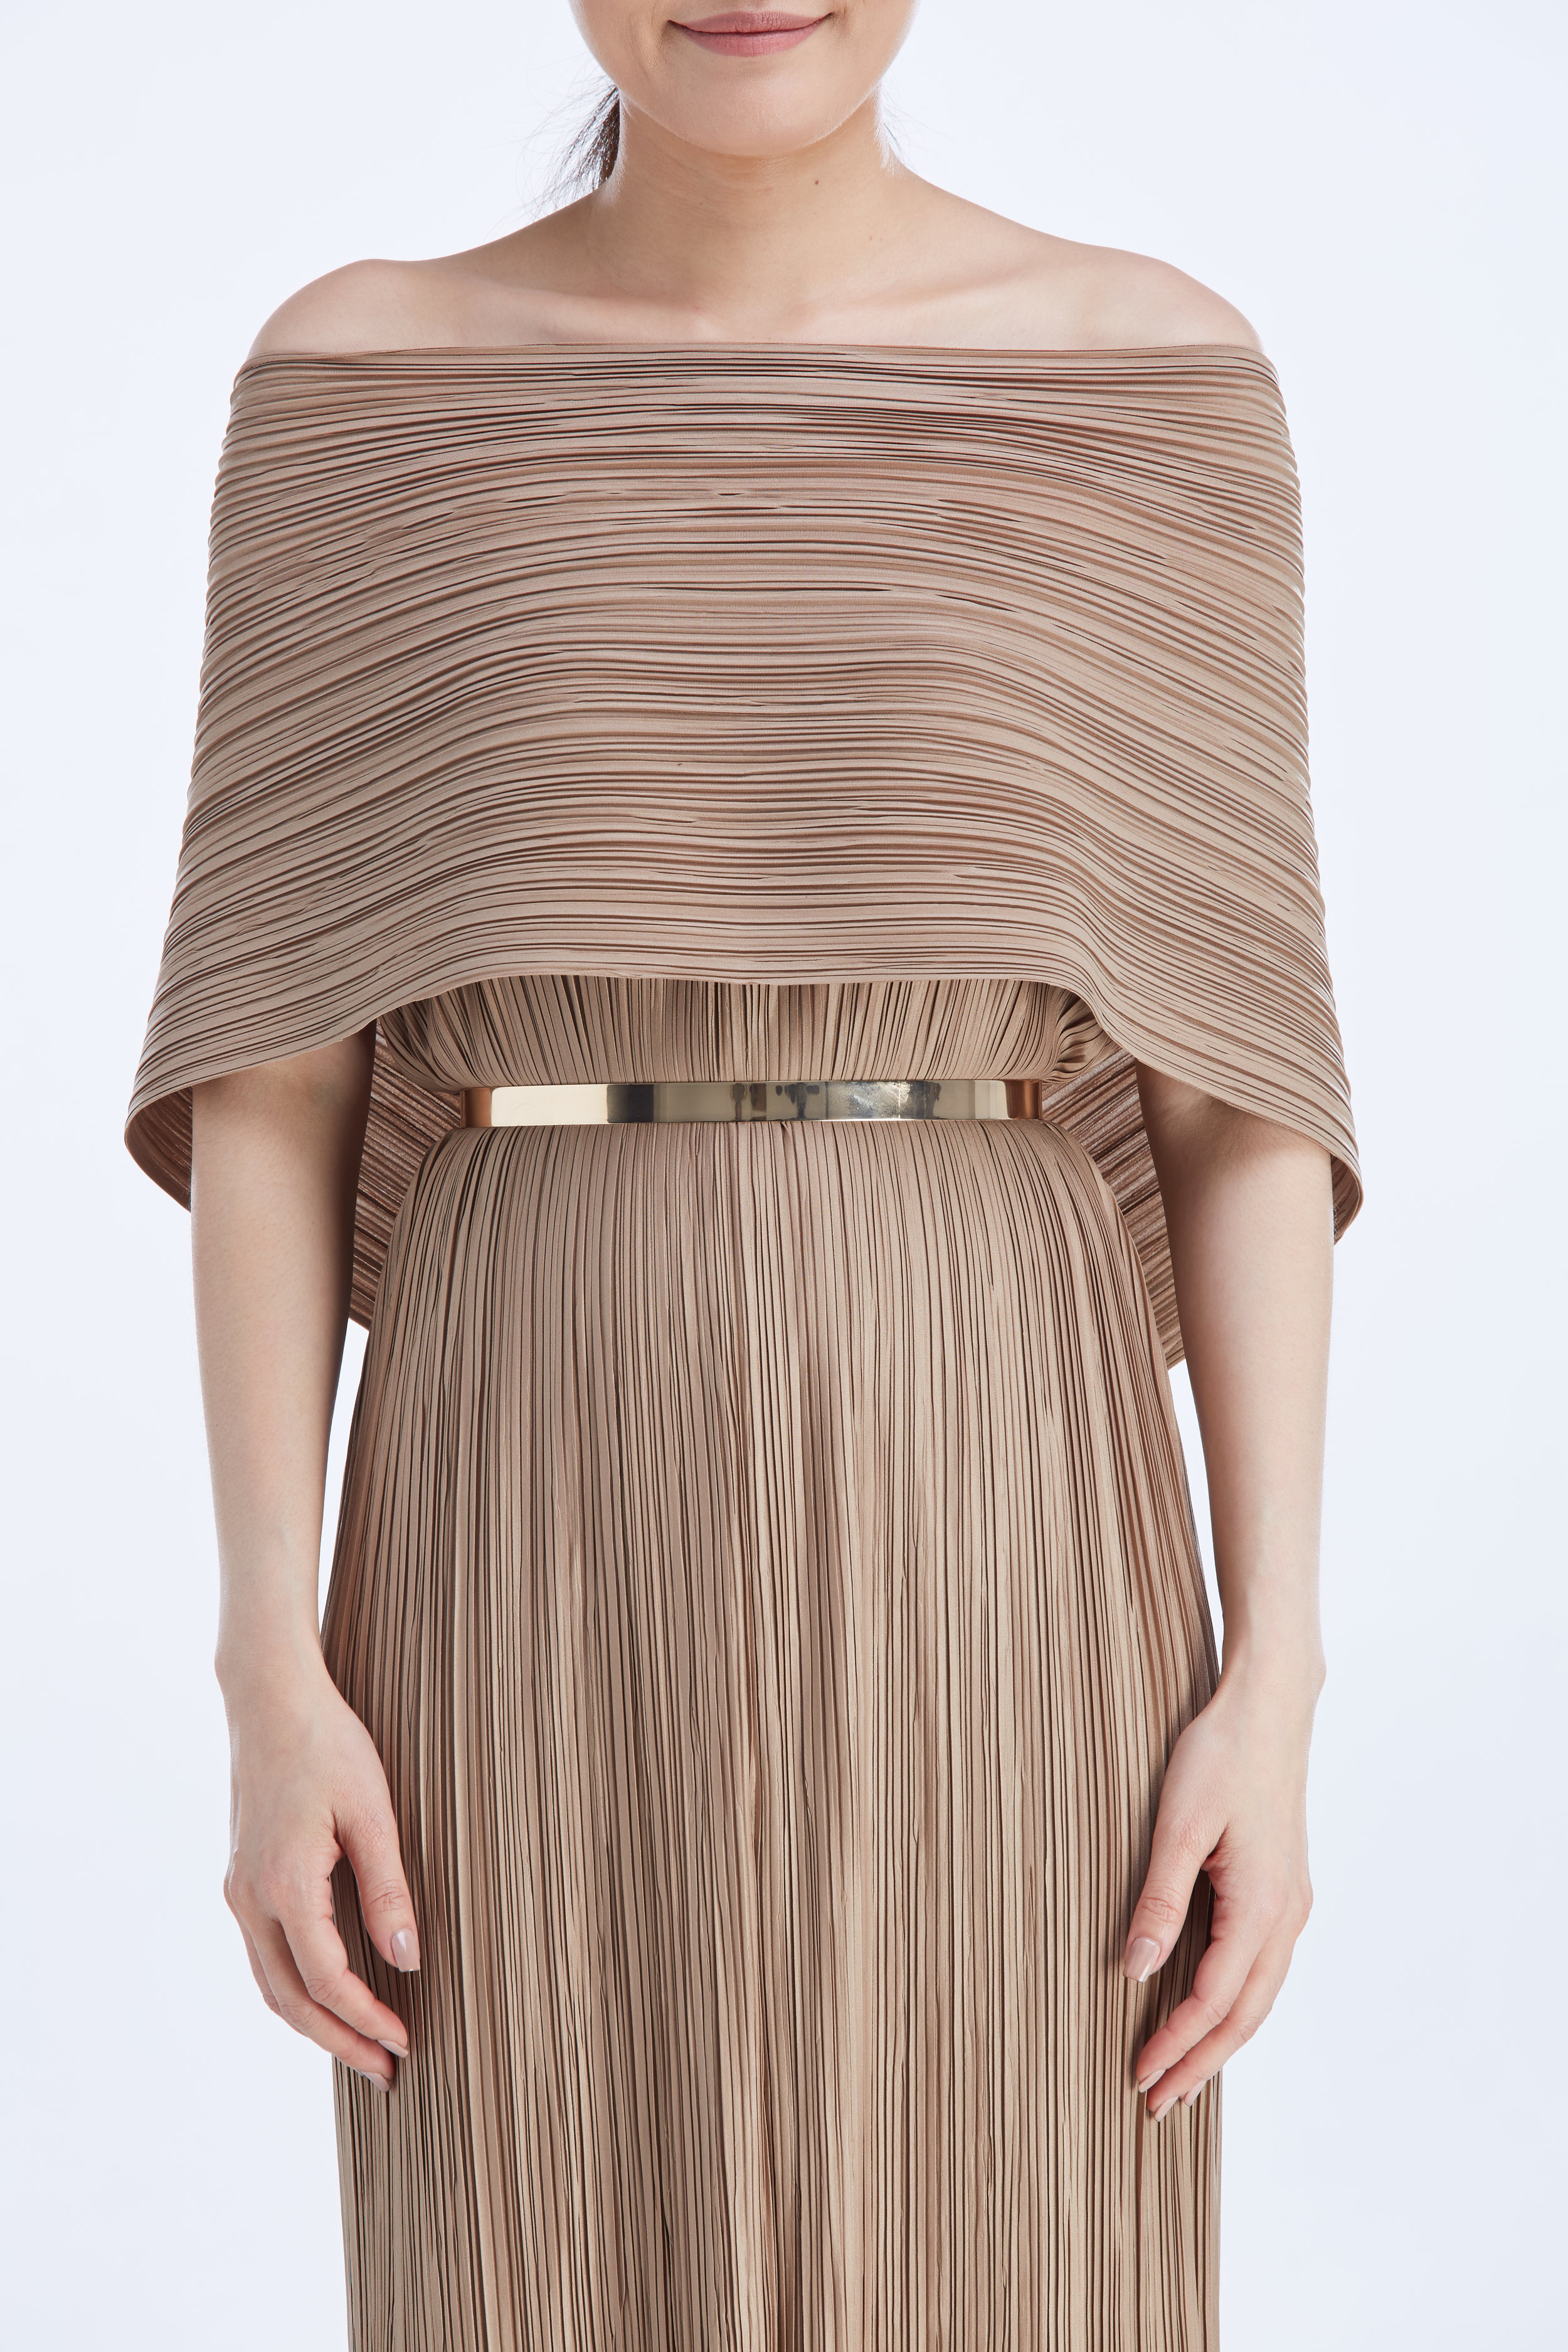 PLATE BELT (ROSE GOLD) worn with  OSCAR DRESS